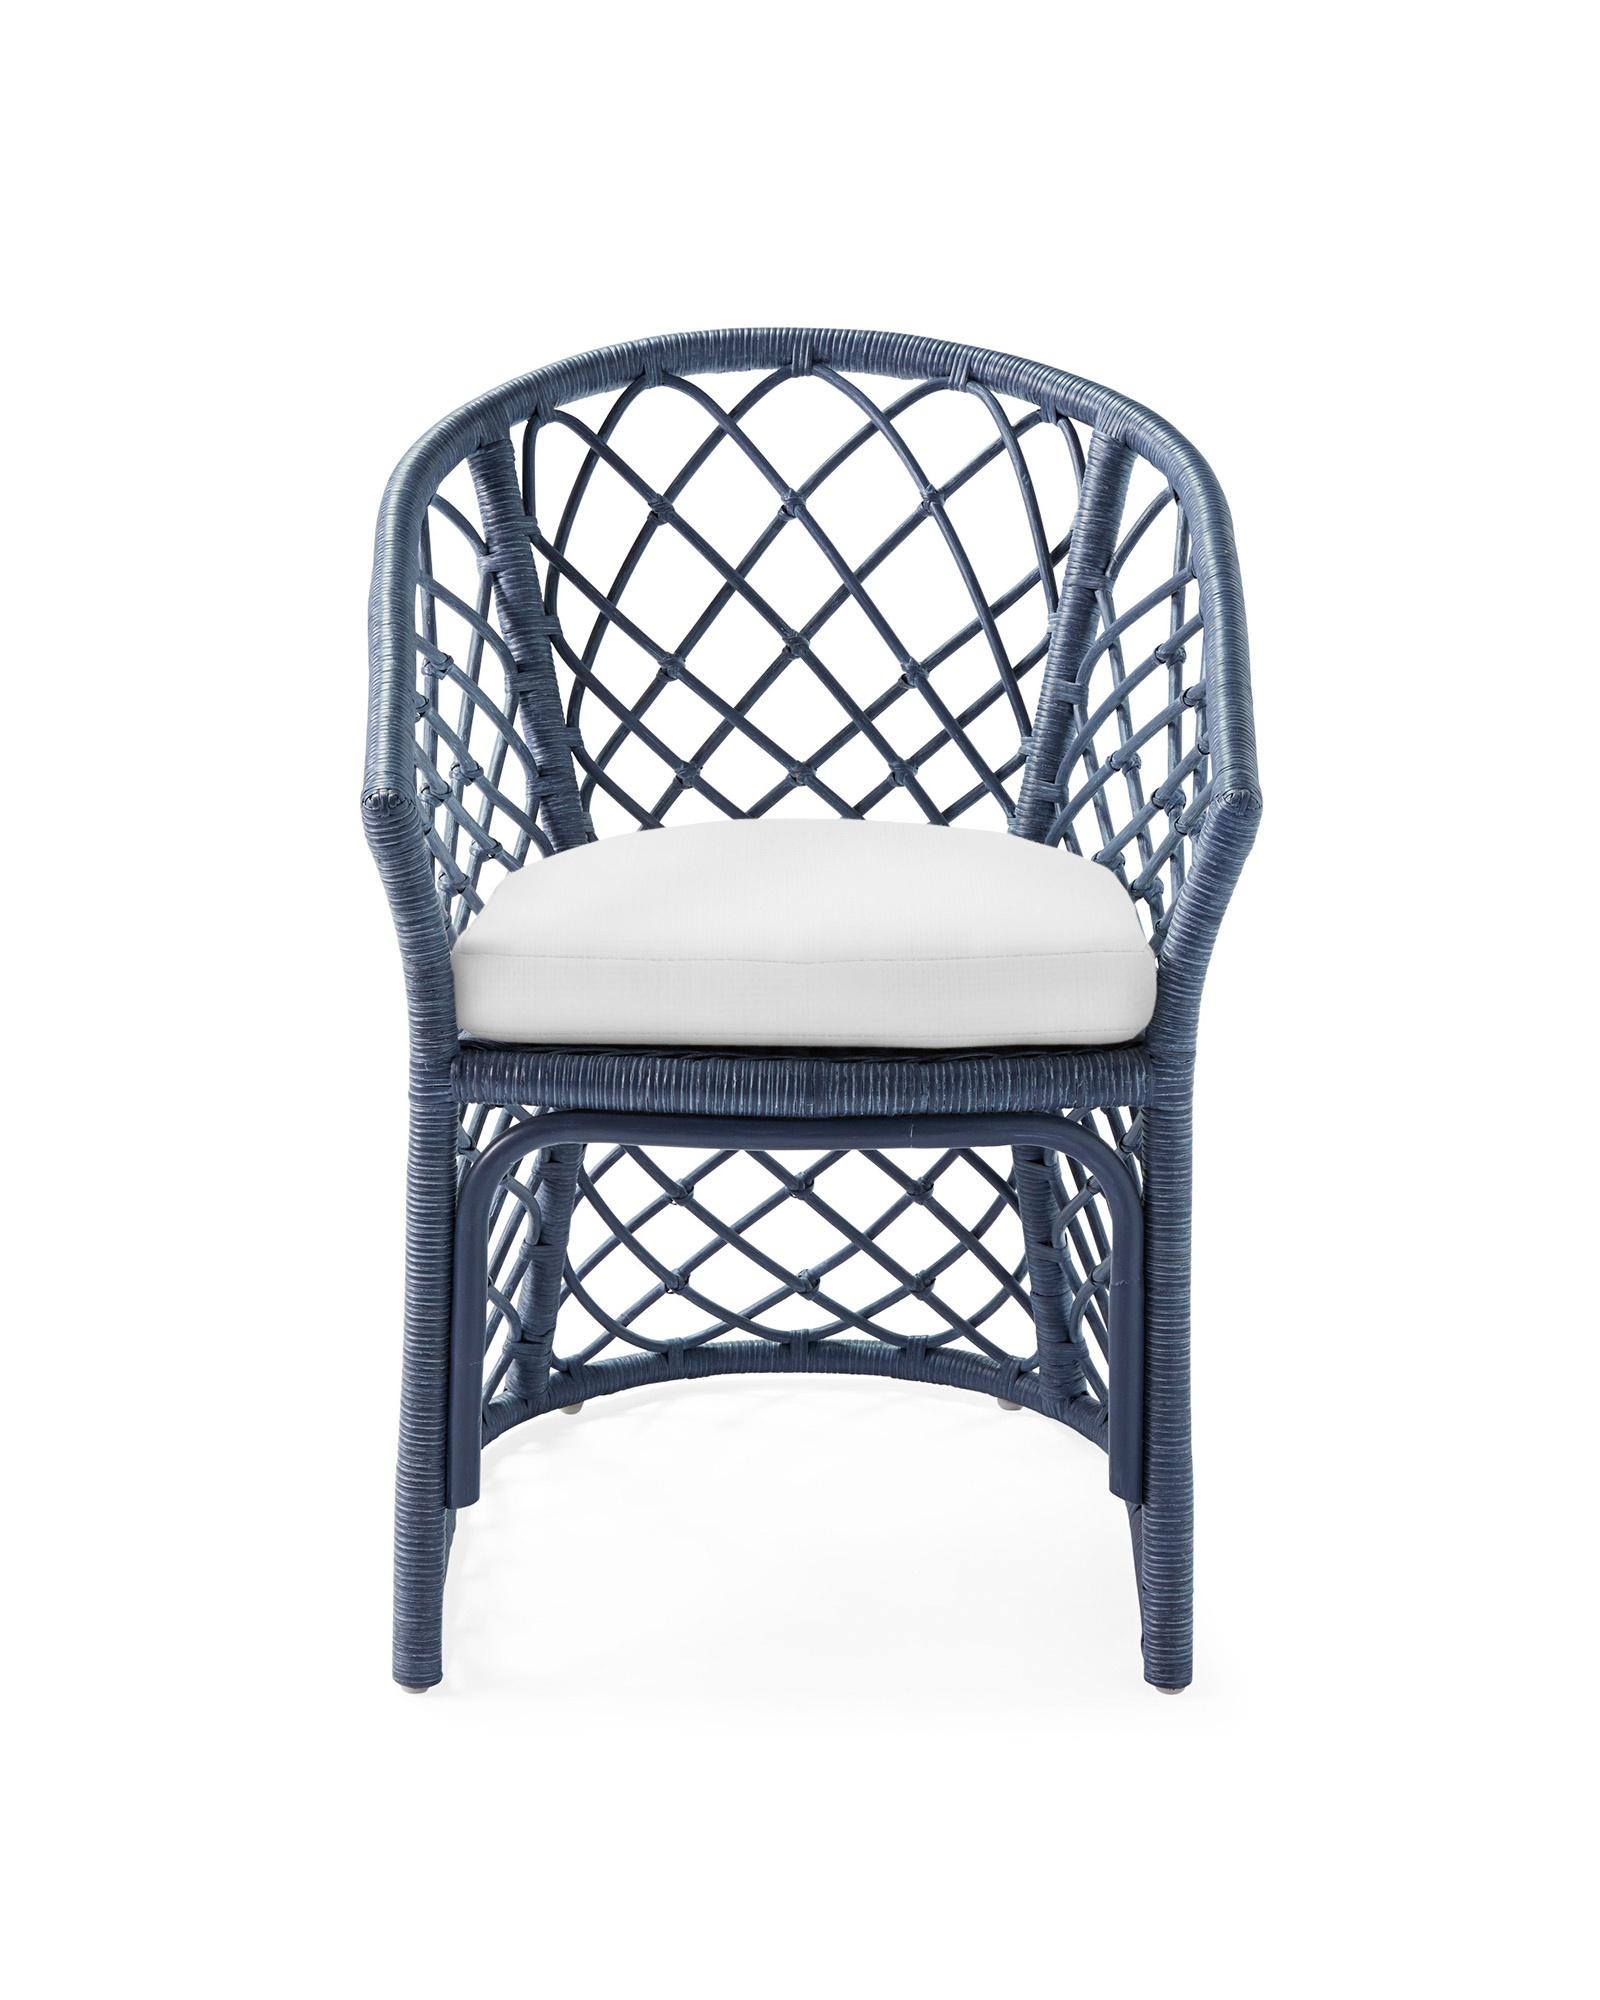 Avalon Dining Chair - Vintage Indigo